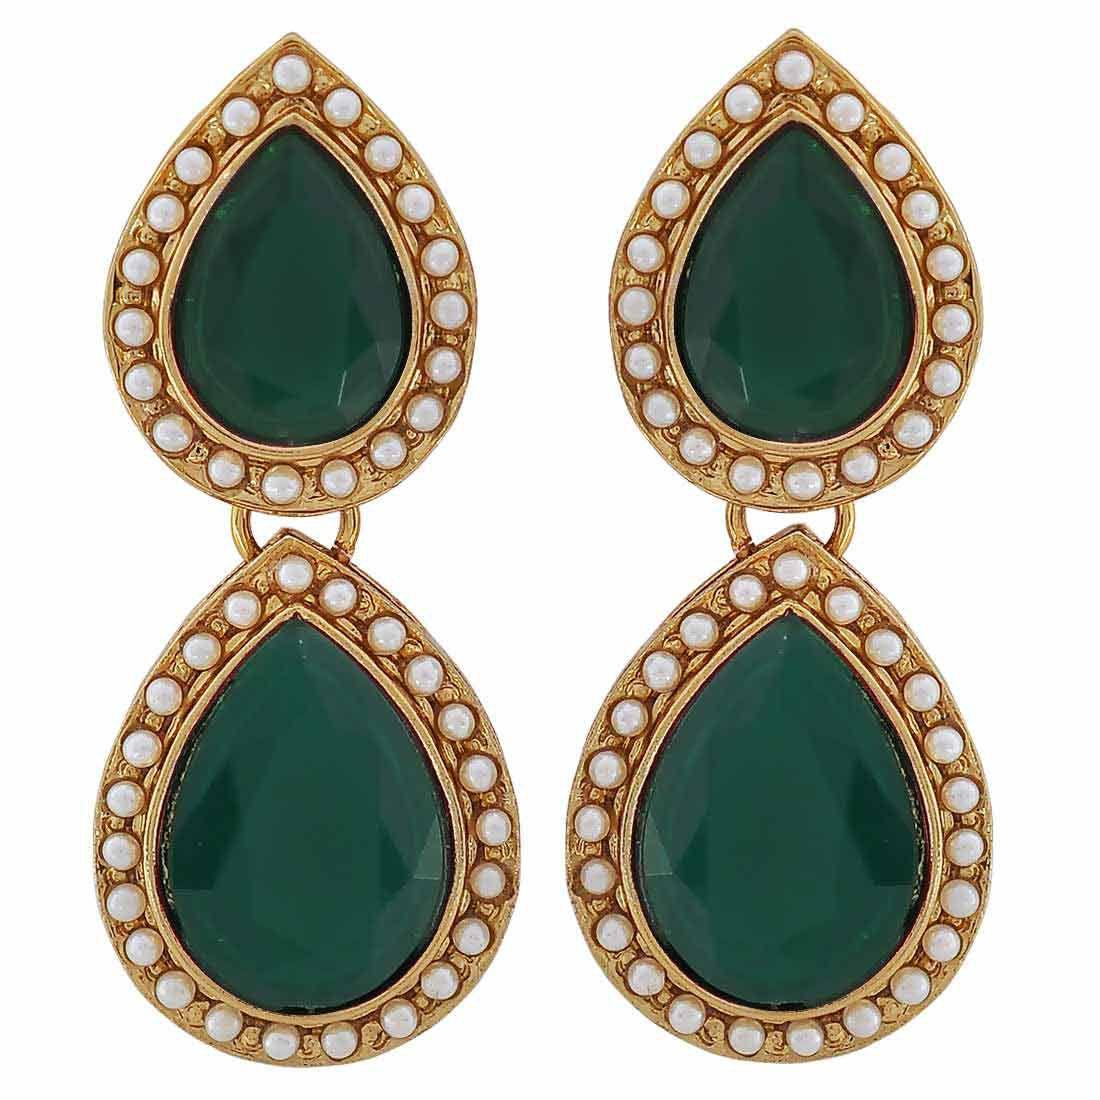 Maayra Wedding Earrings Alloy Dangler Drop Green Twin Drop Pearls Jewellery